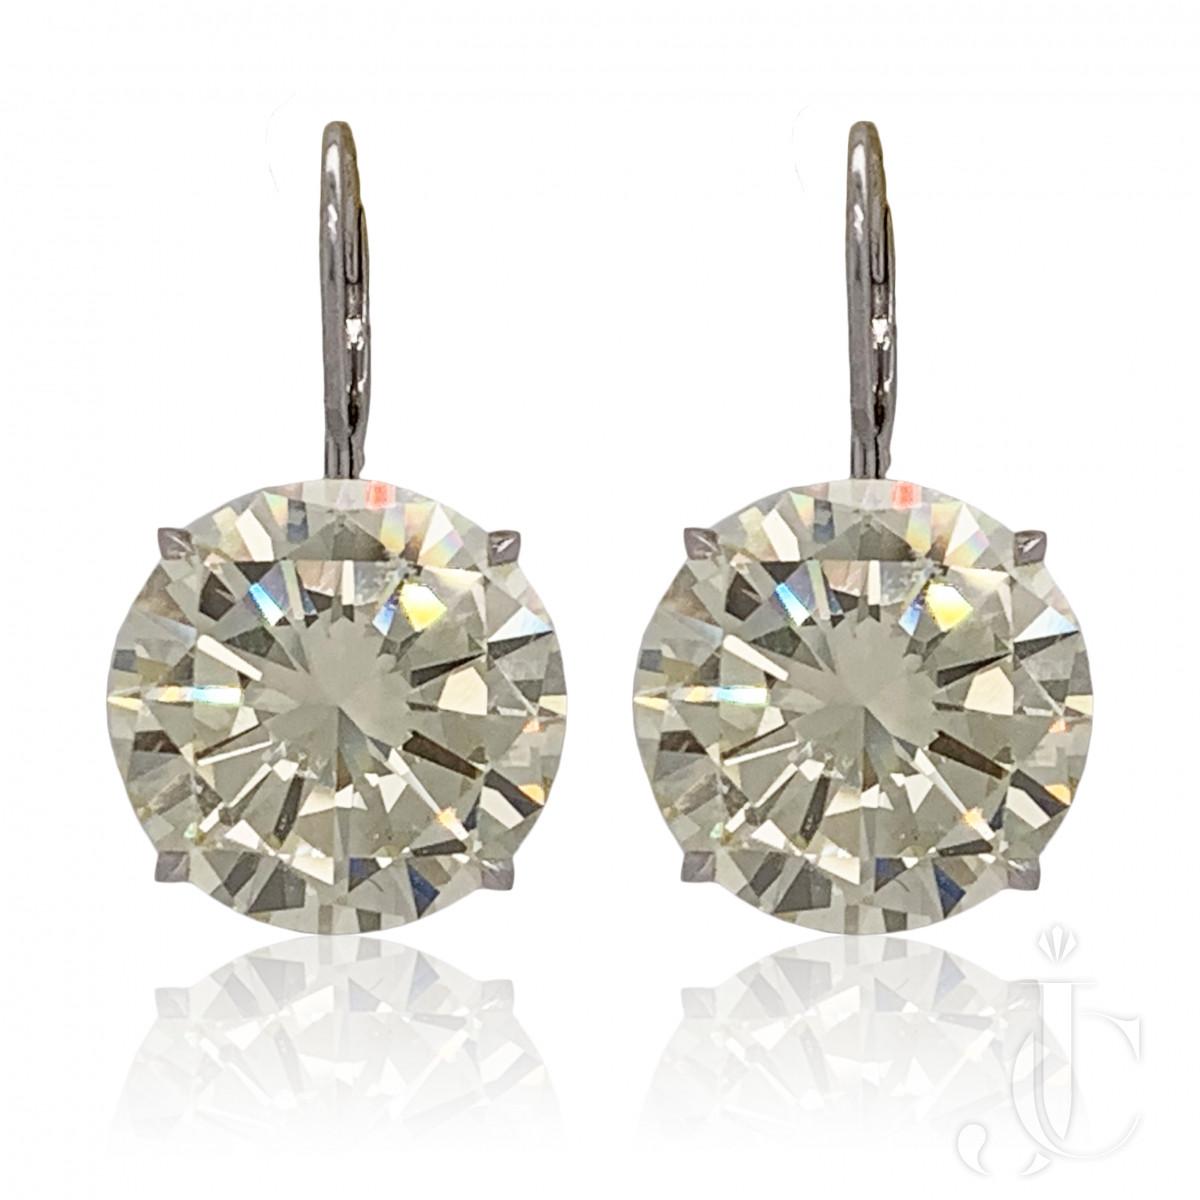 Impressive 19.59cts/19.32cts Cape Diamond Earrings